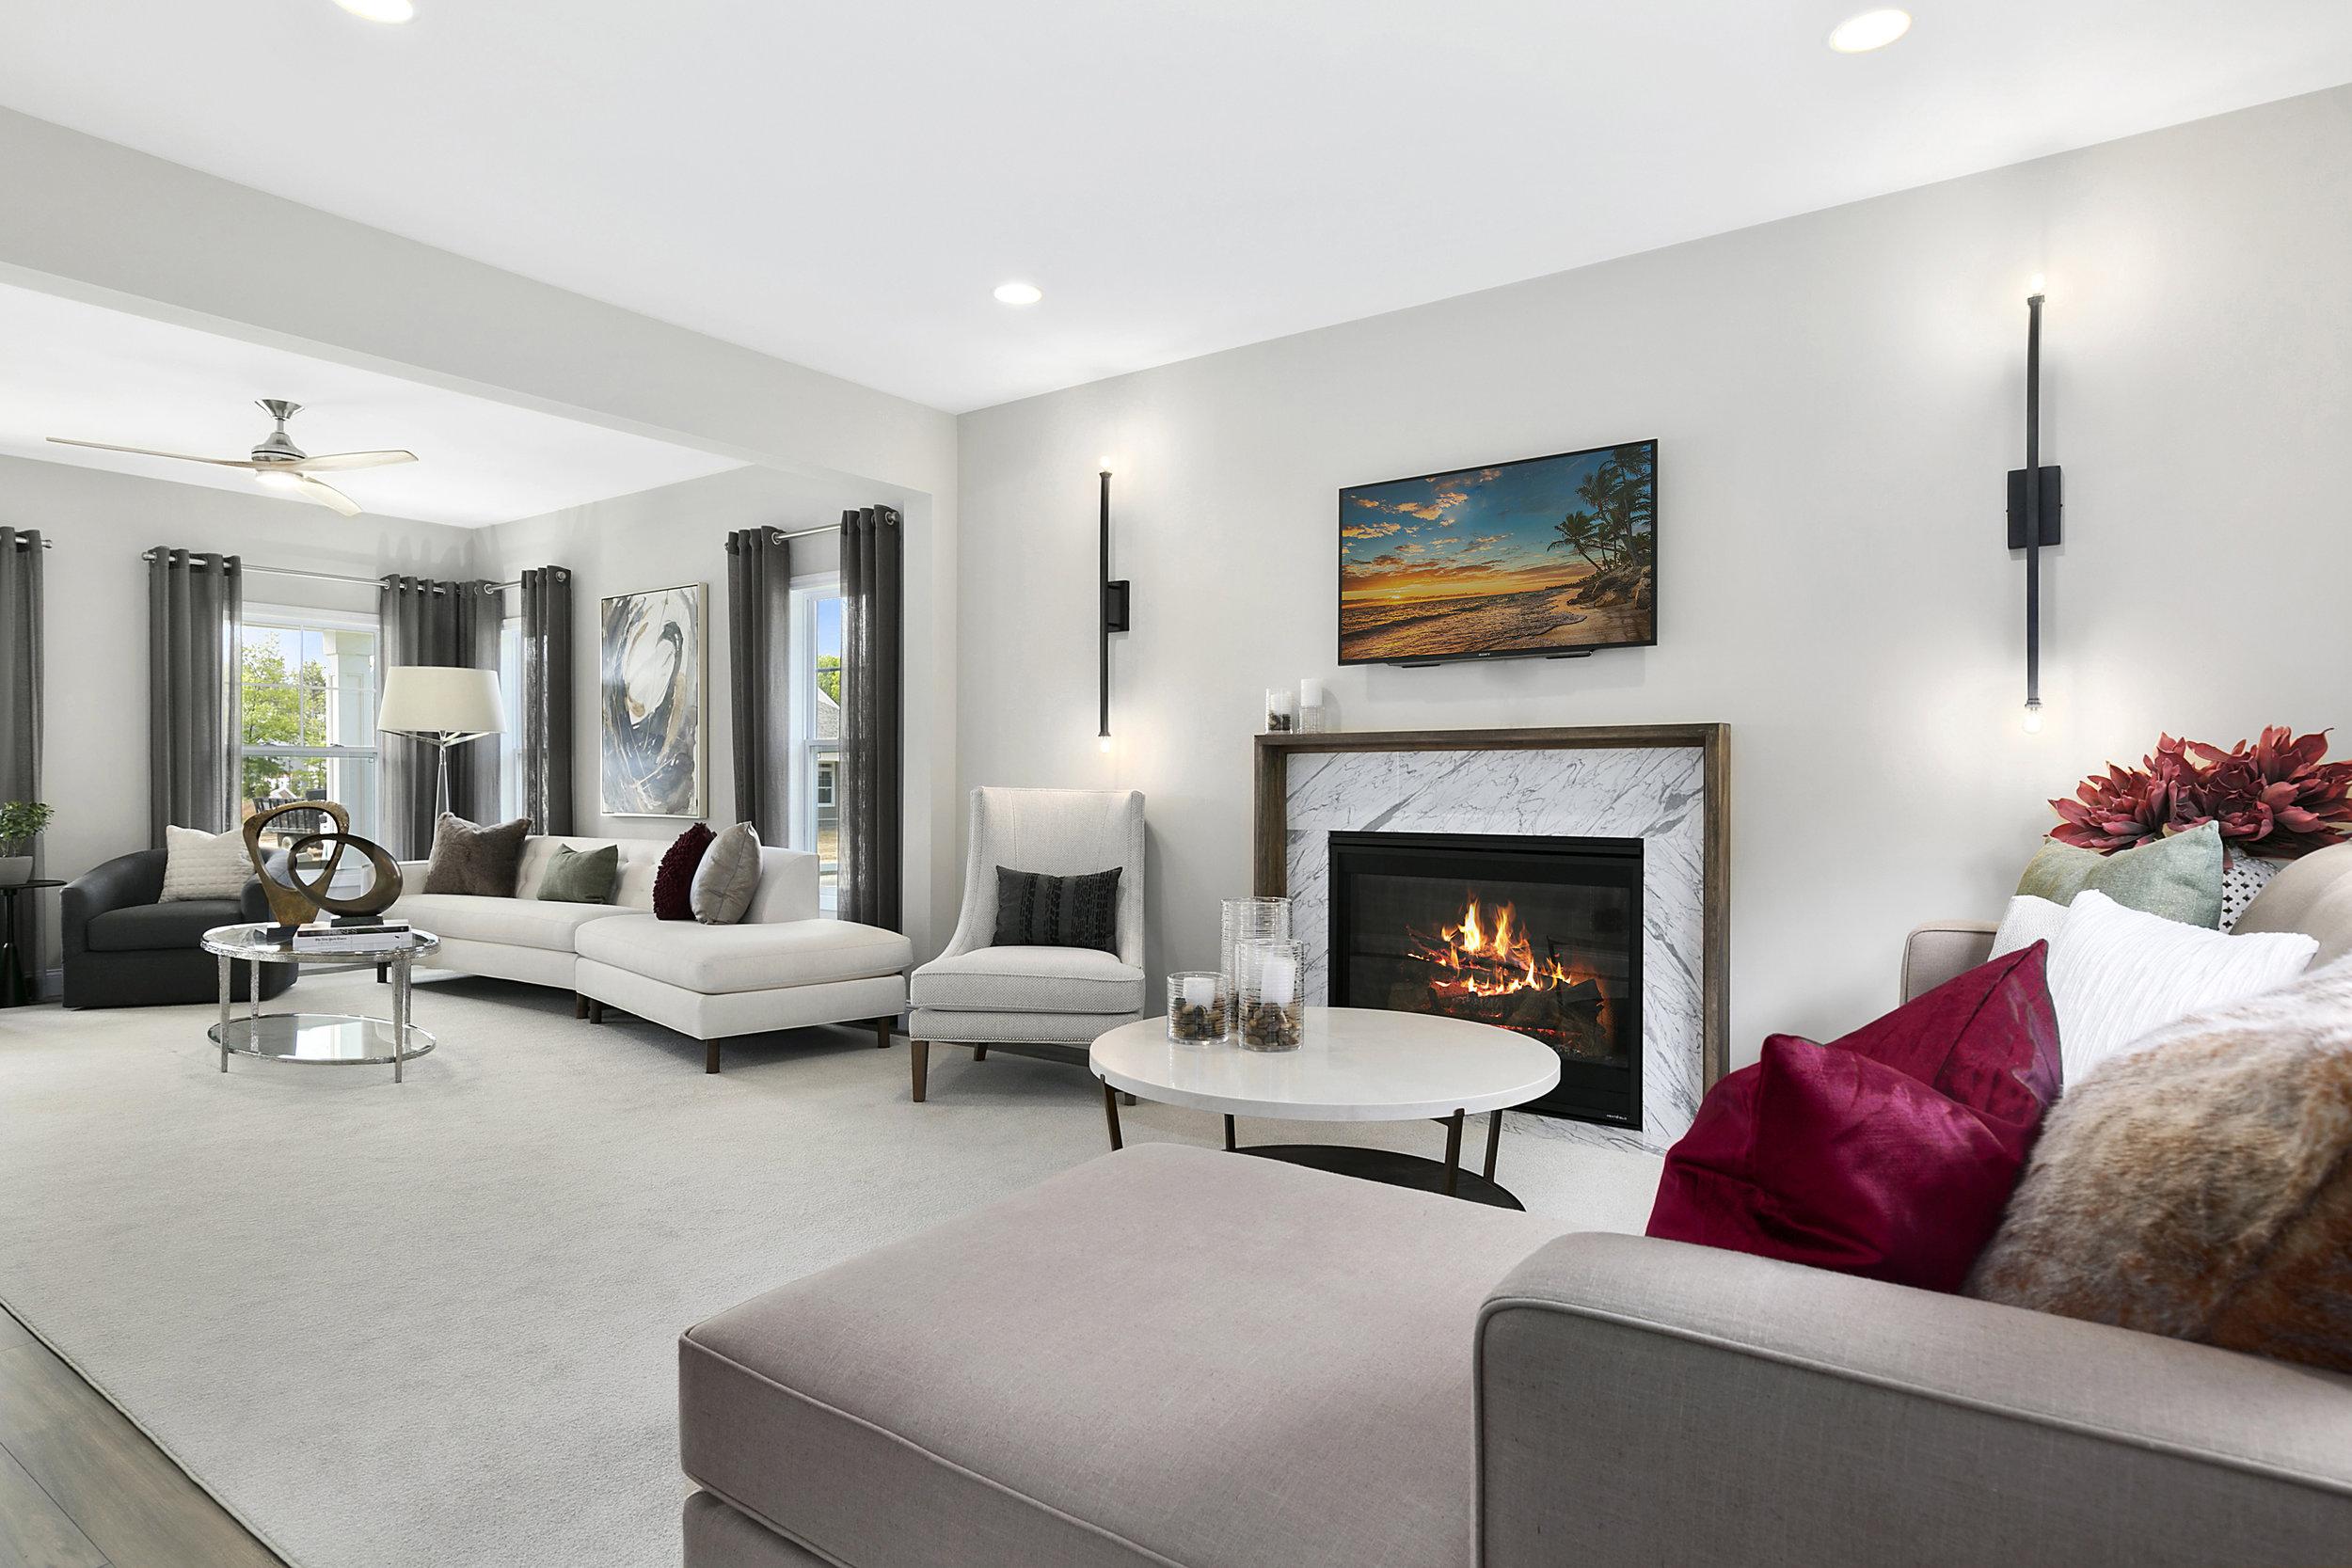 Model Homes - Lita Dirks & Co. Interior Design and Merchandising Firm